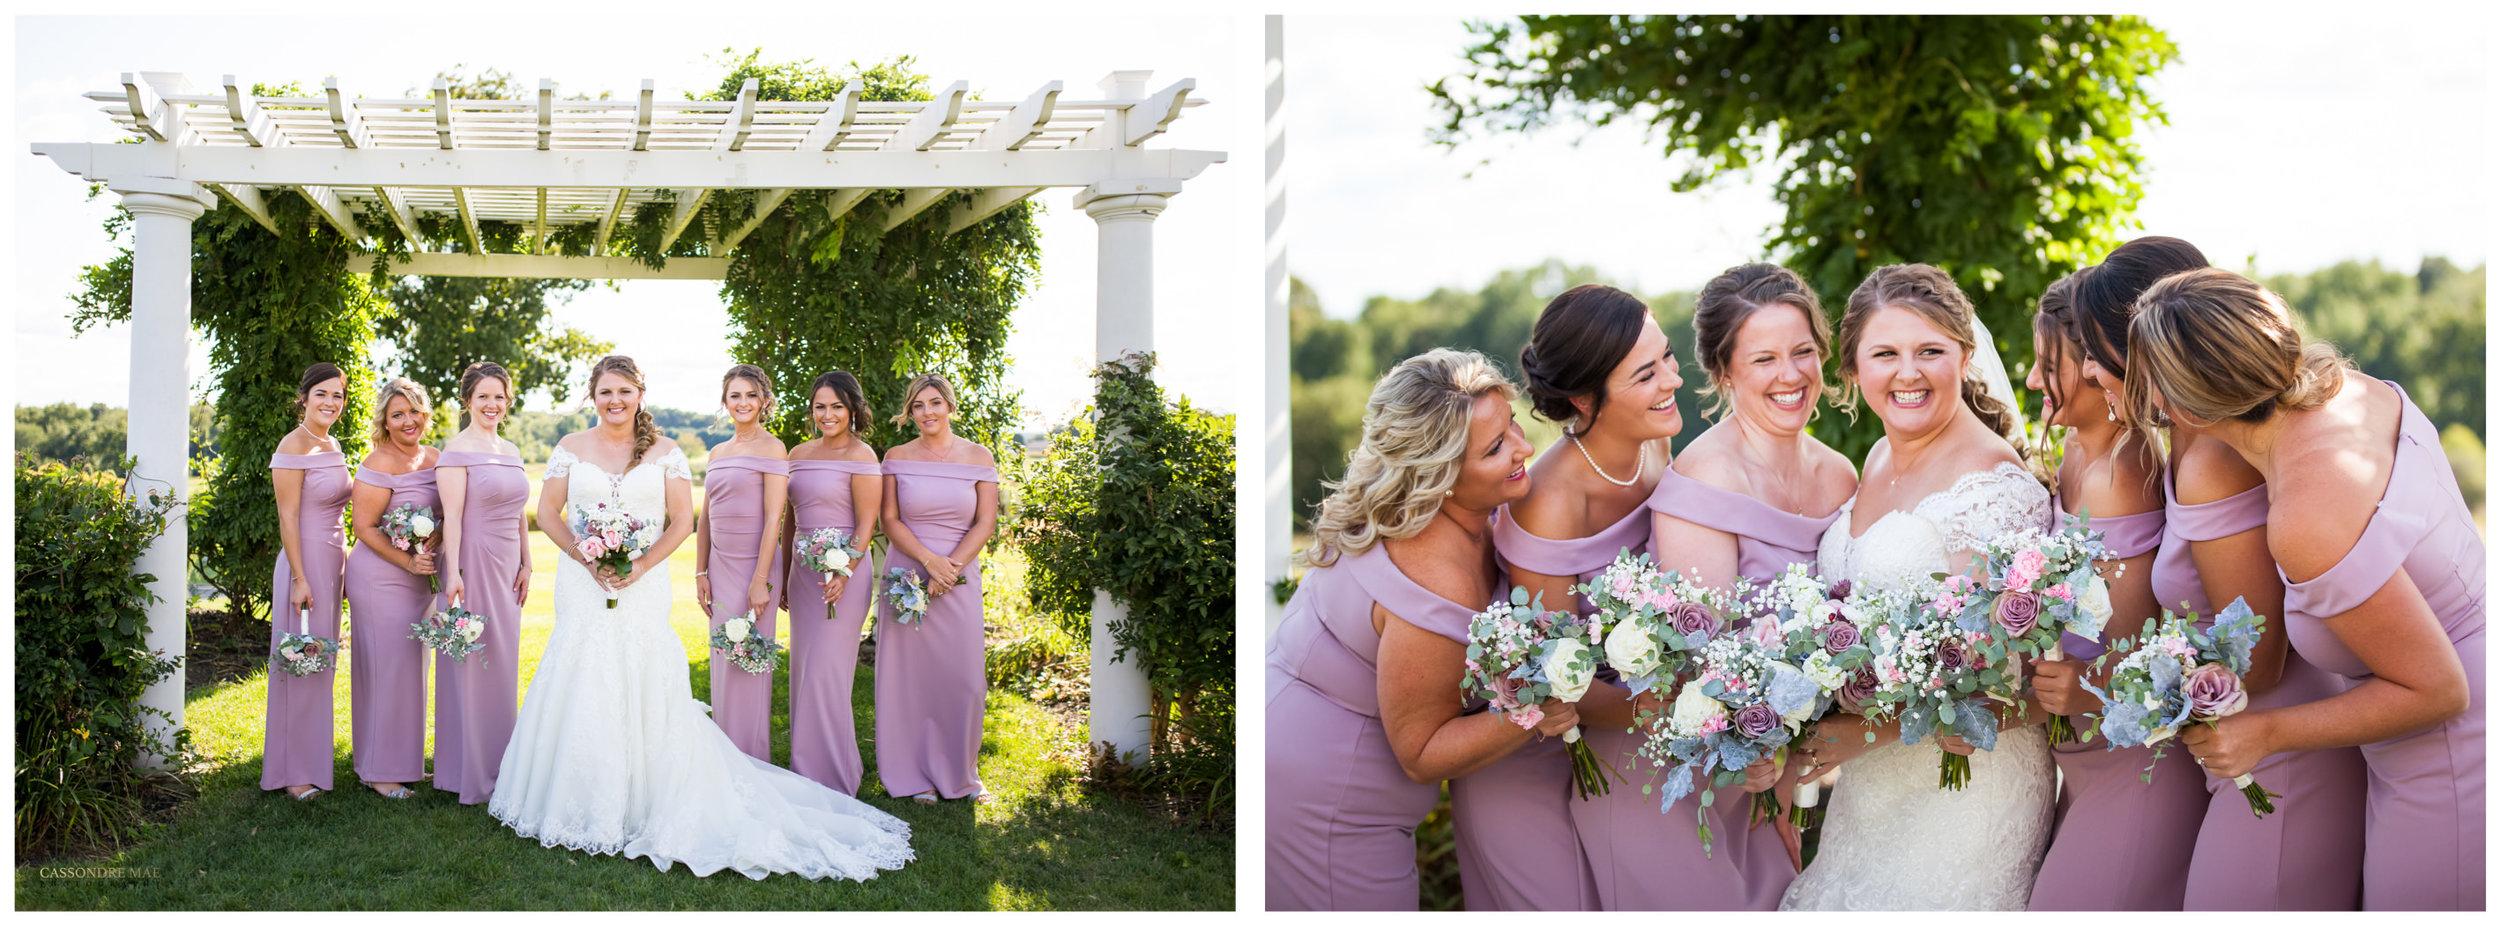 Cassondre Mae Photography The Links Wedding Photographer 11.jpg